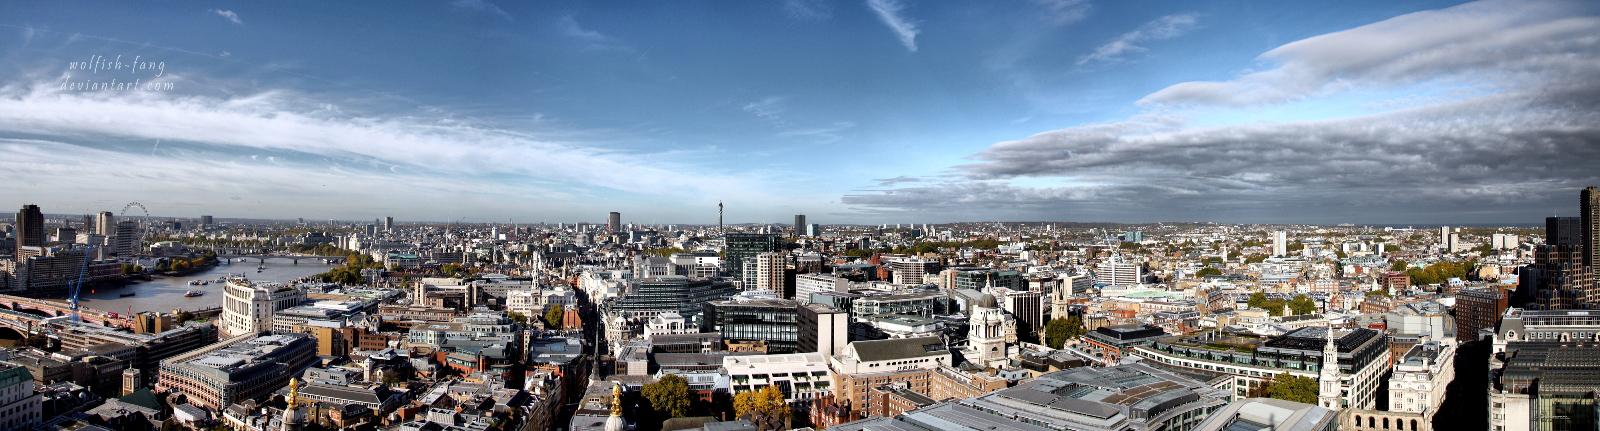 Panorama of London by wolfish-fang